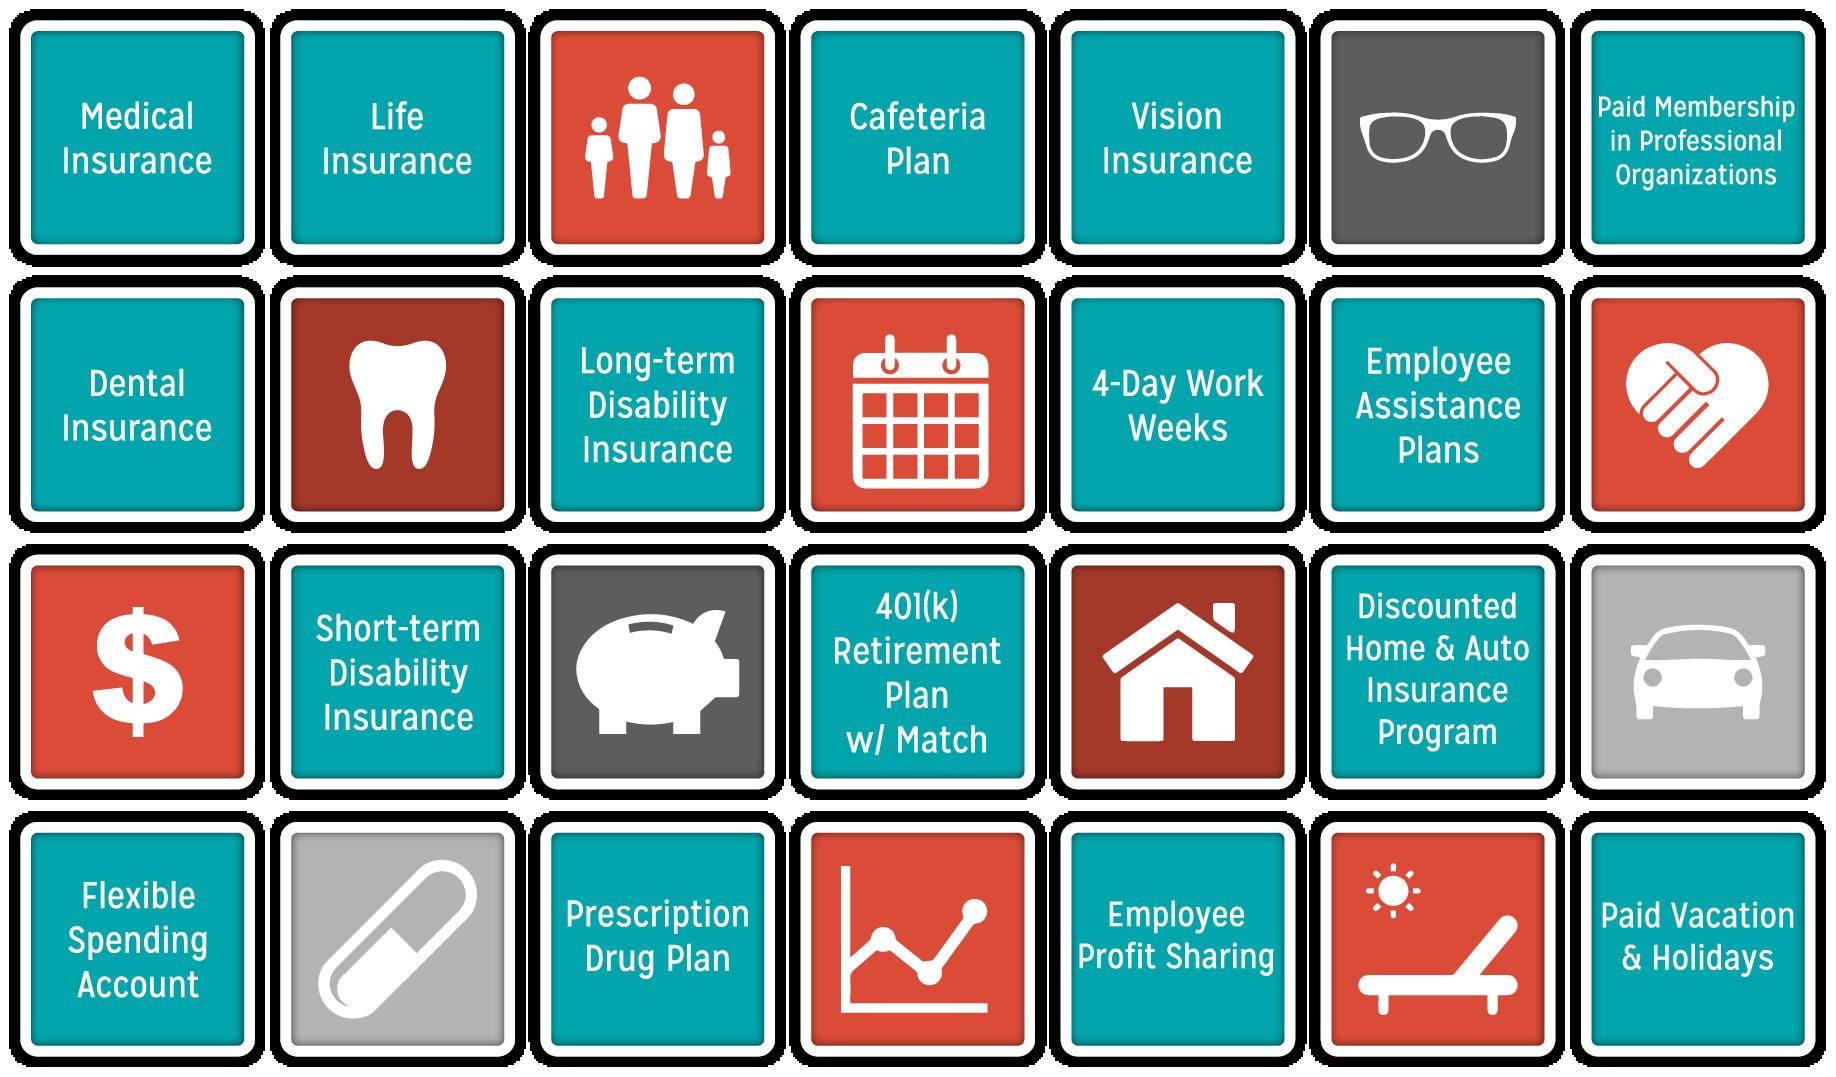 Benefits-25.png